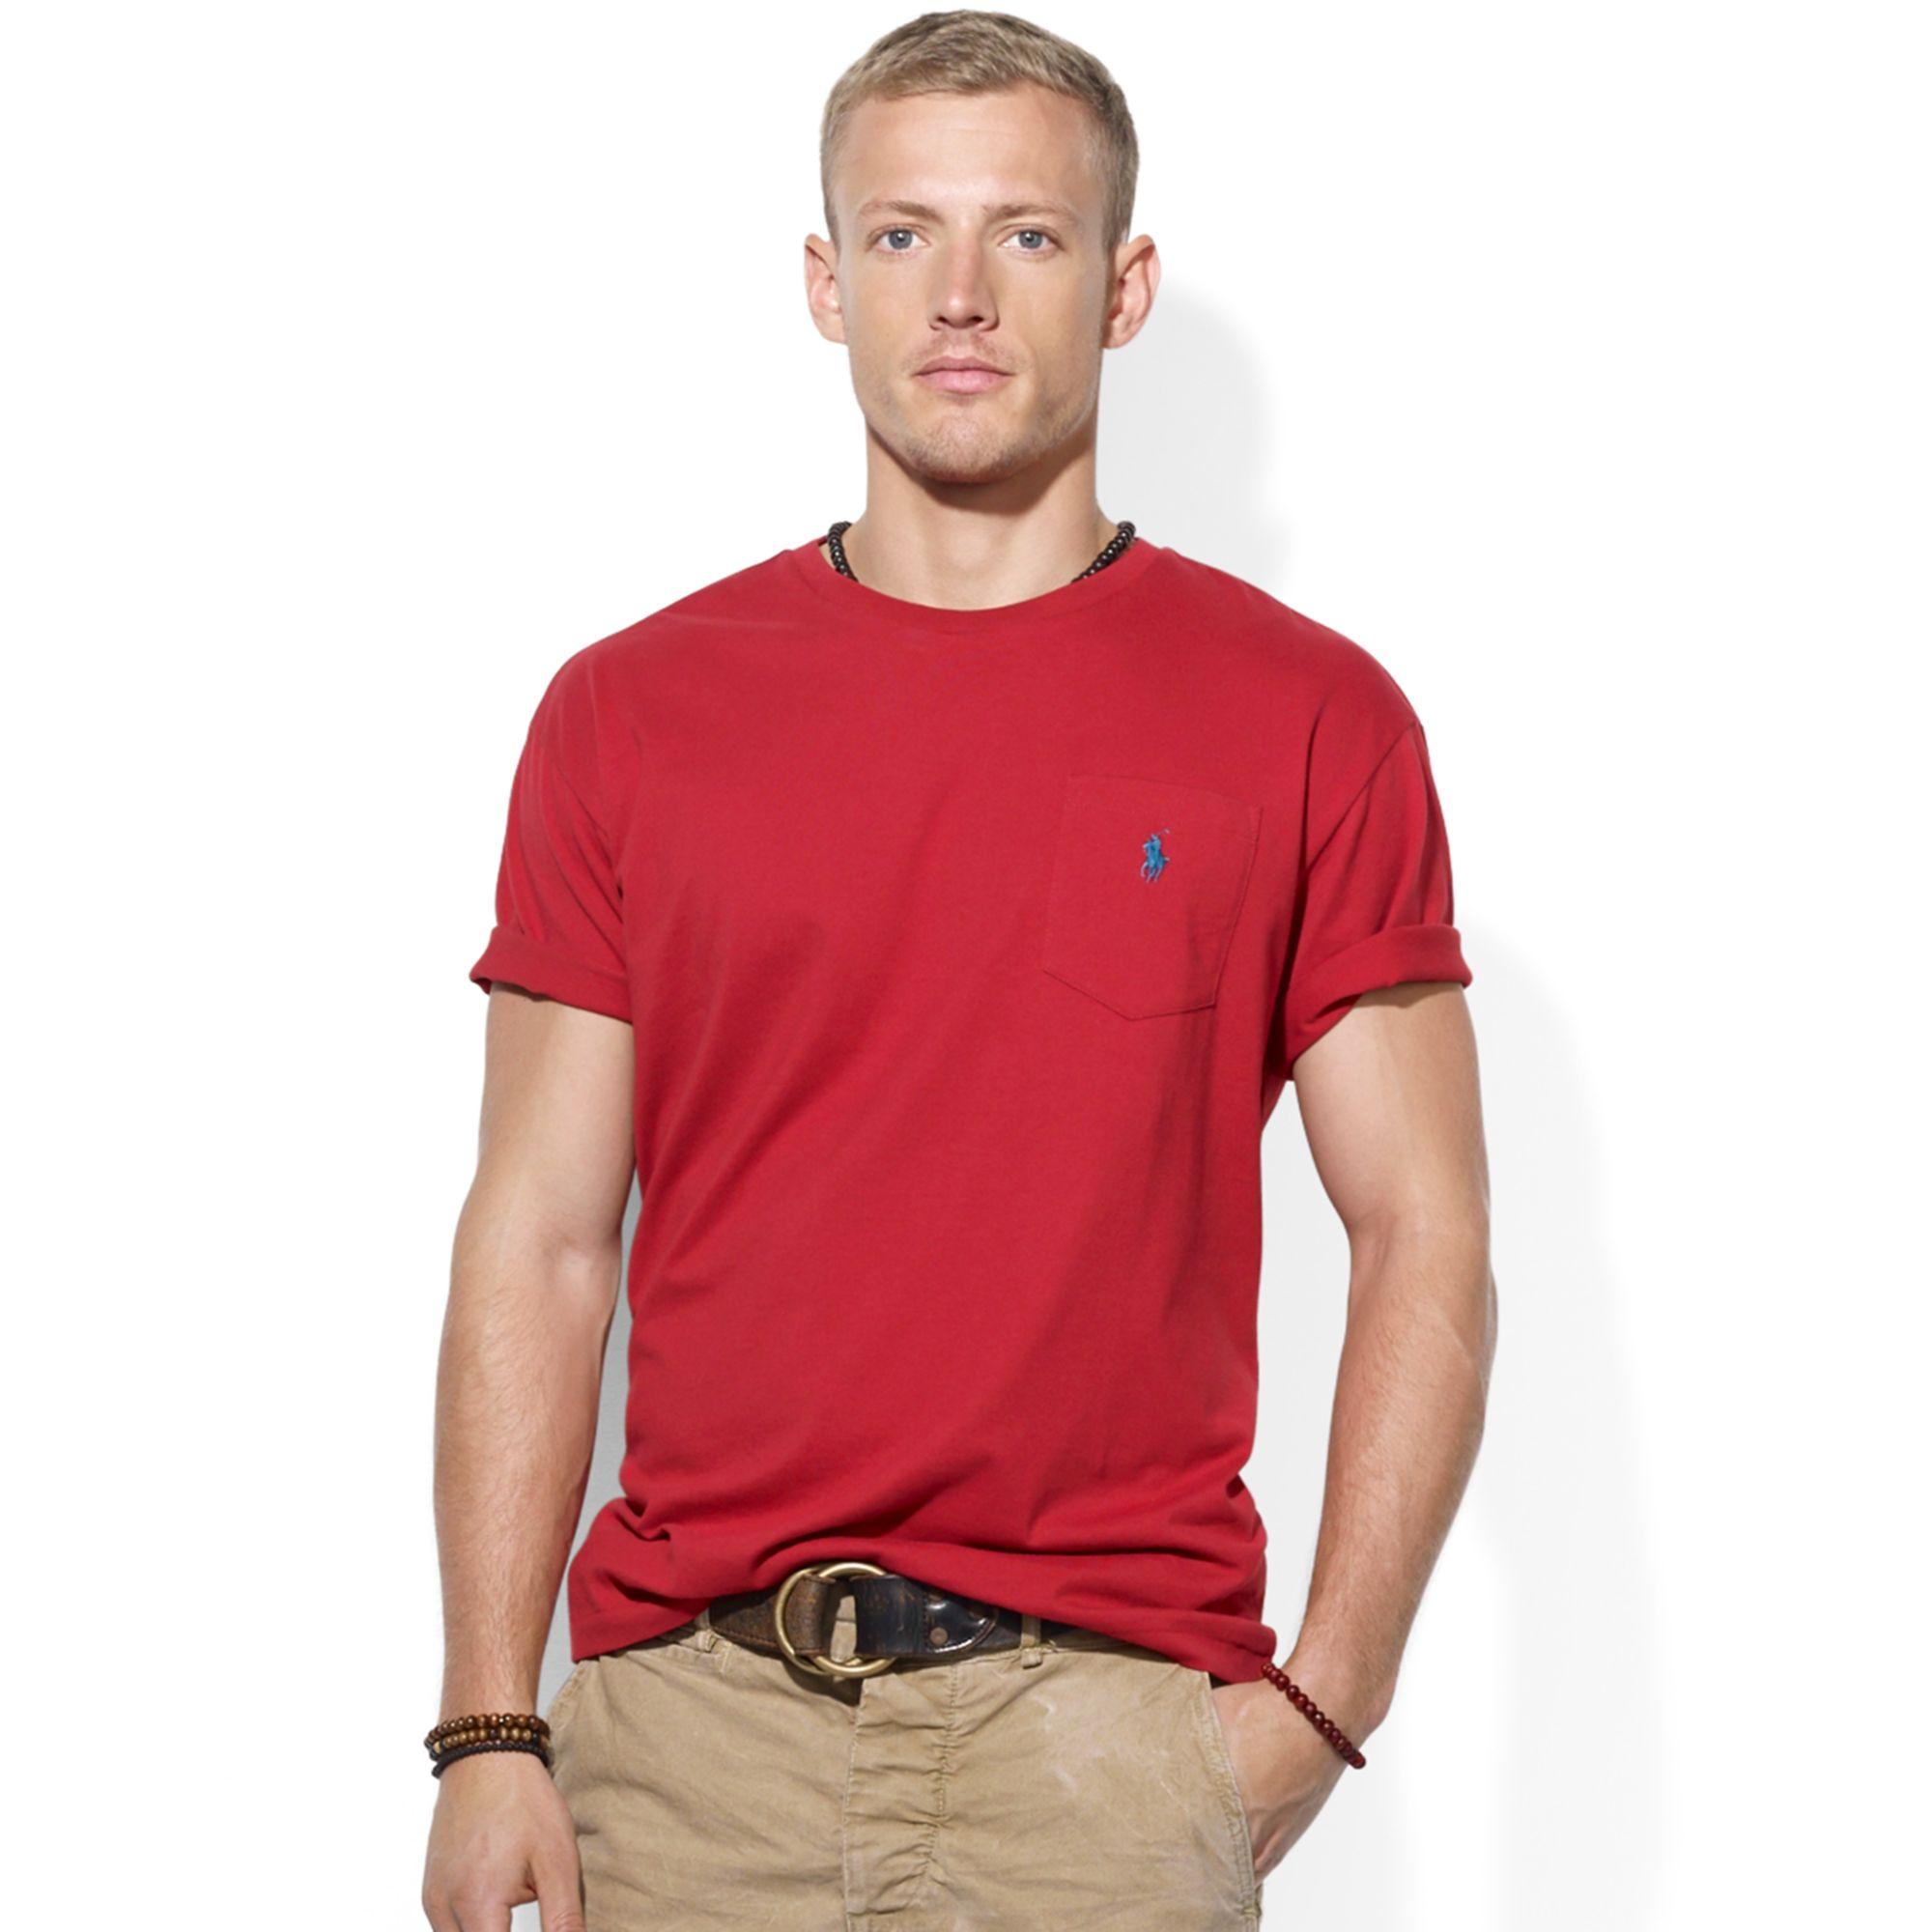 Polo ralph lauren classic fit jersey pocket crew neck t for Ralph lauren polo jersey shirt